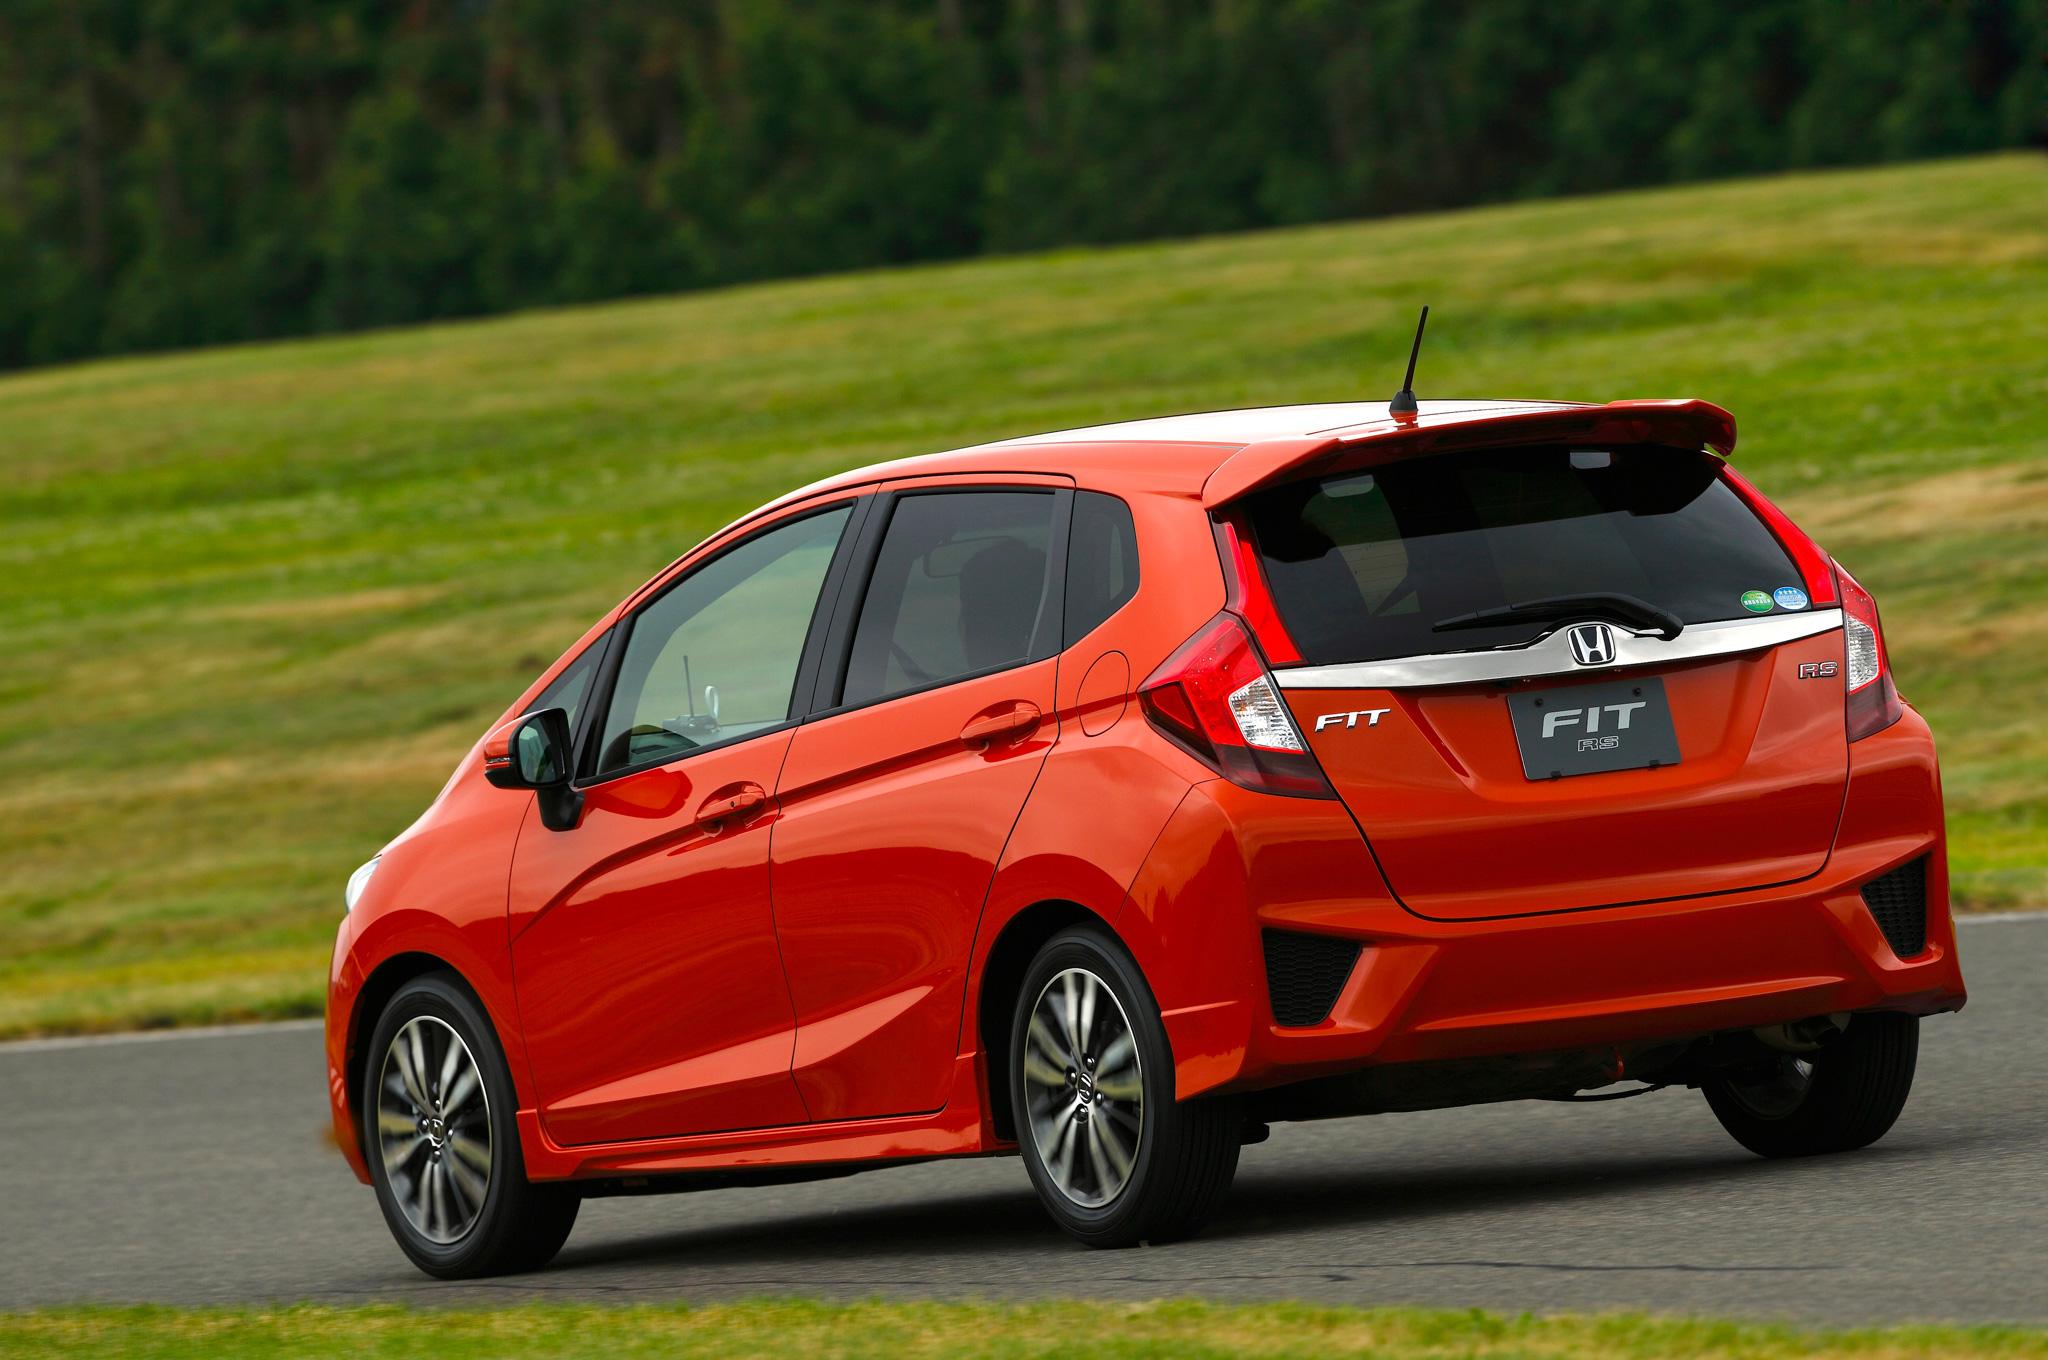 2014 Honda Jazz / 2015 Honda Fit - Photo Gallery - autoevolution